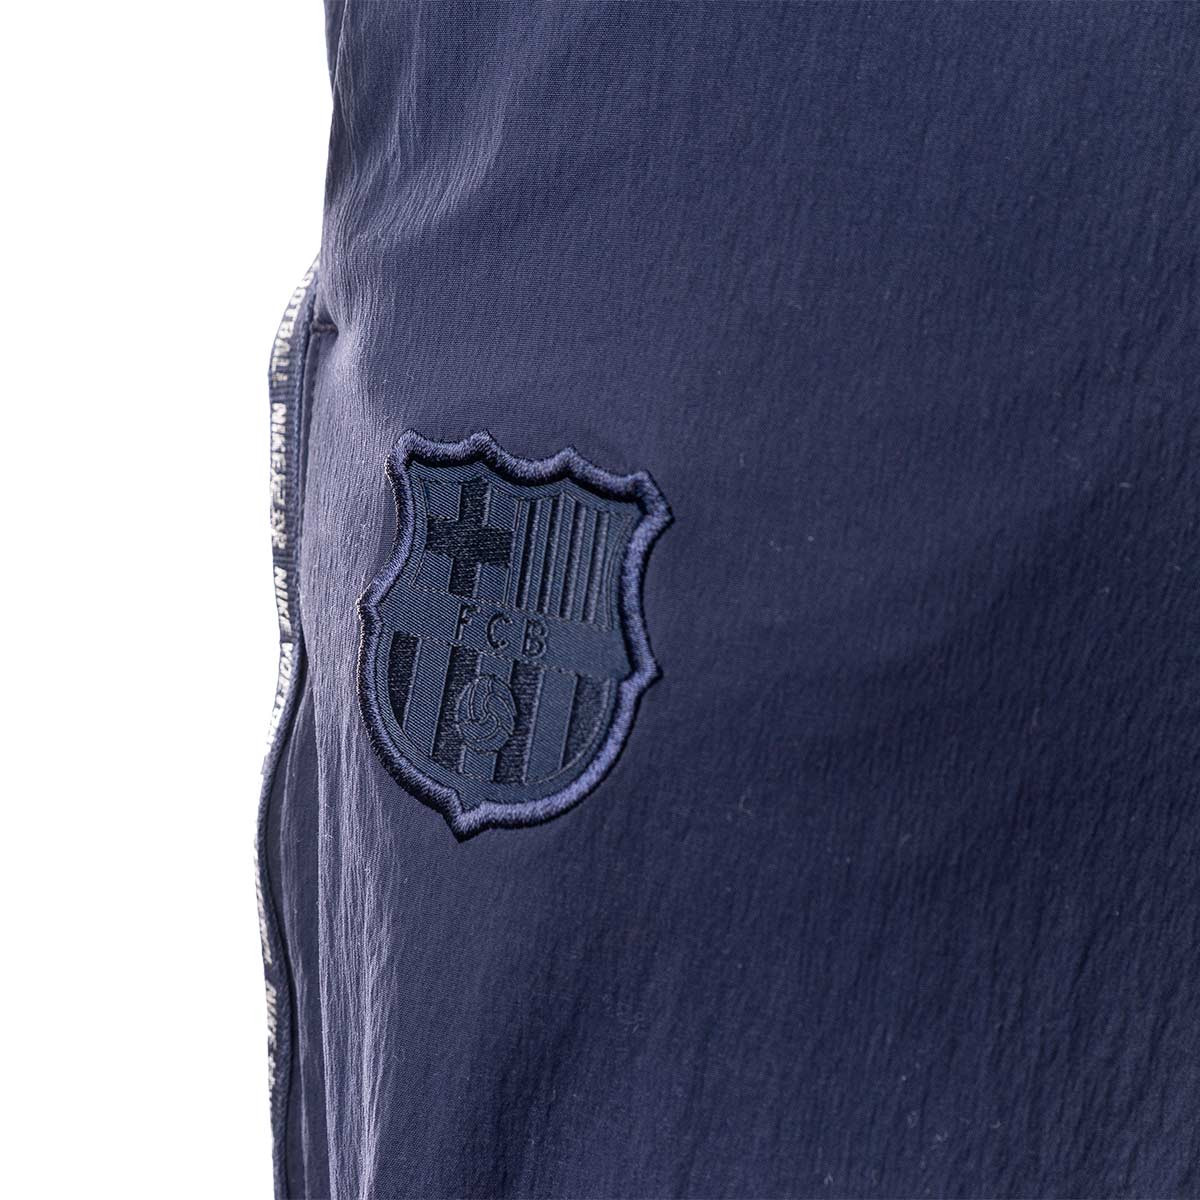 pantalon fc barcelone nike